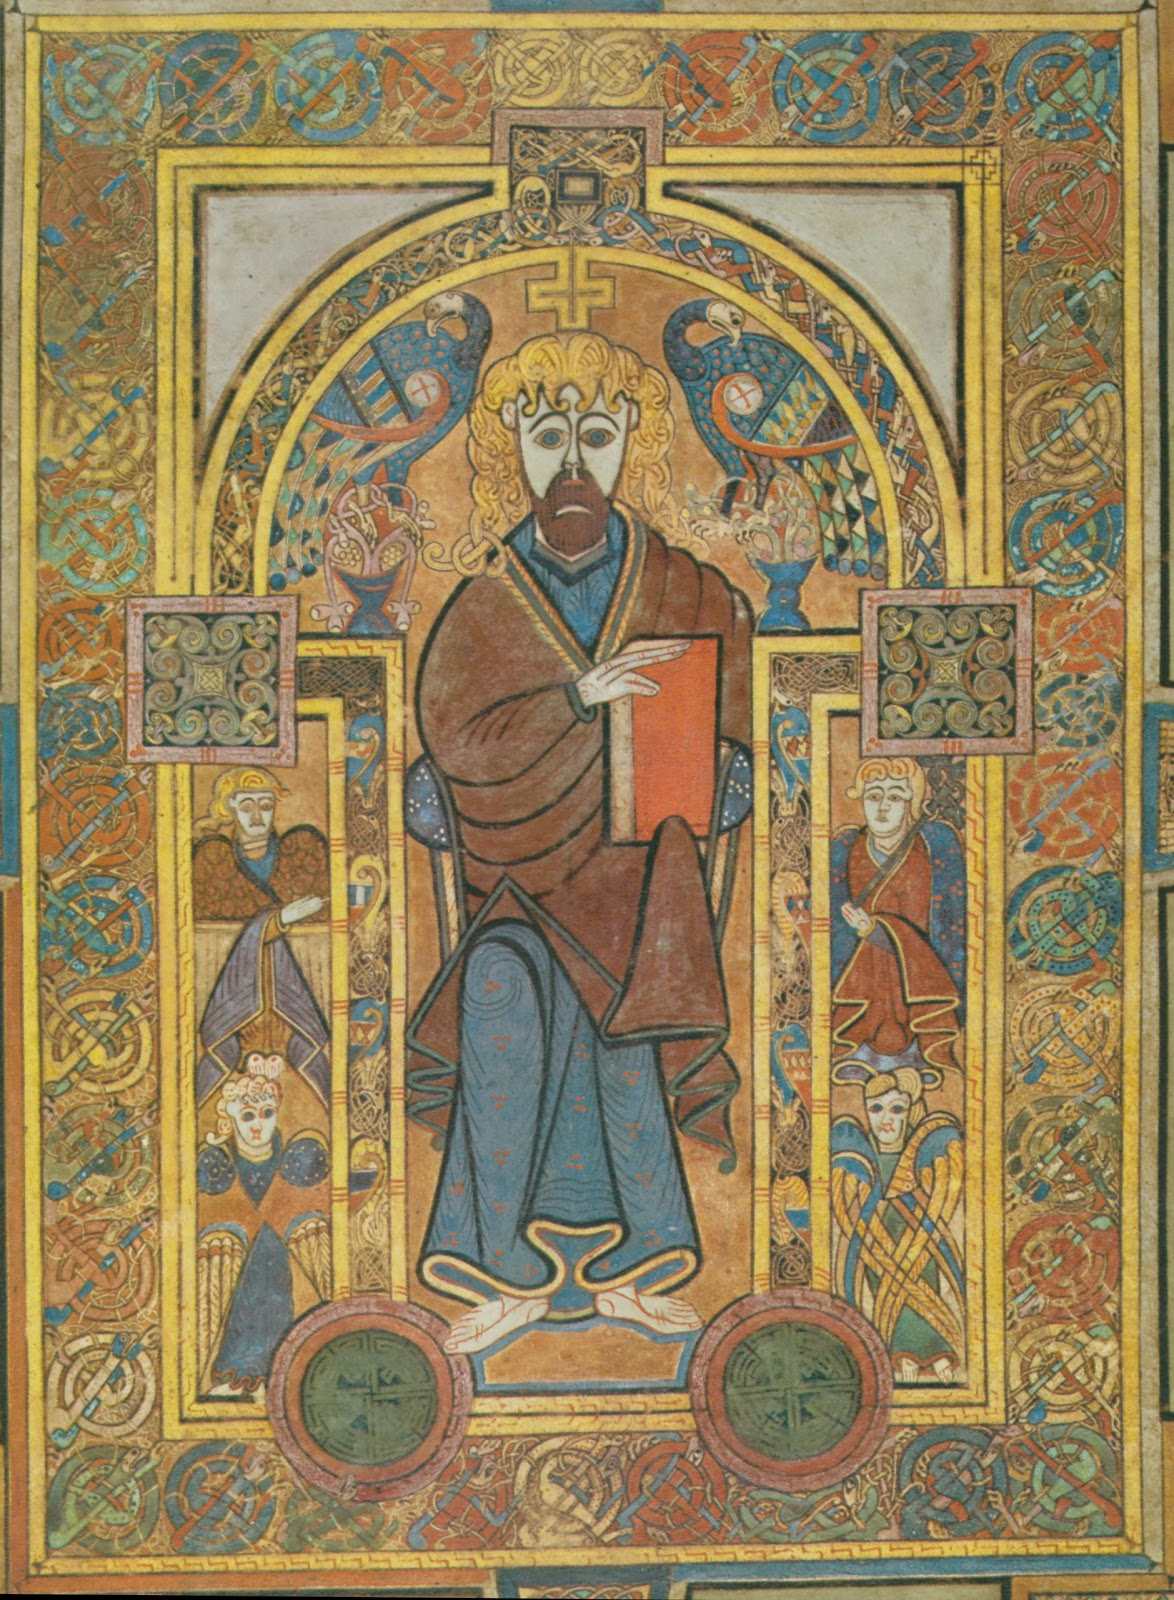 Saint Columbkille Parish Christ The King